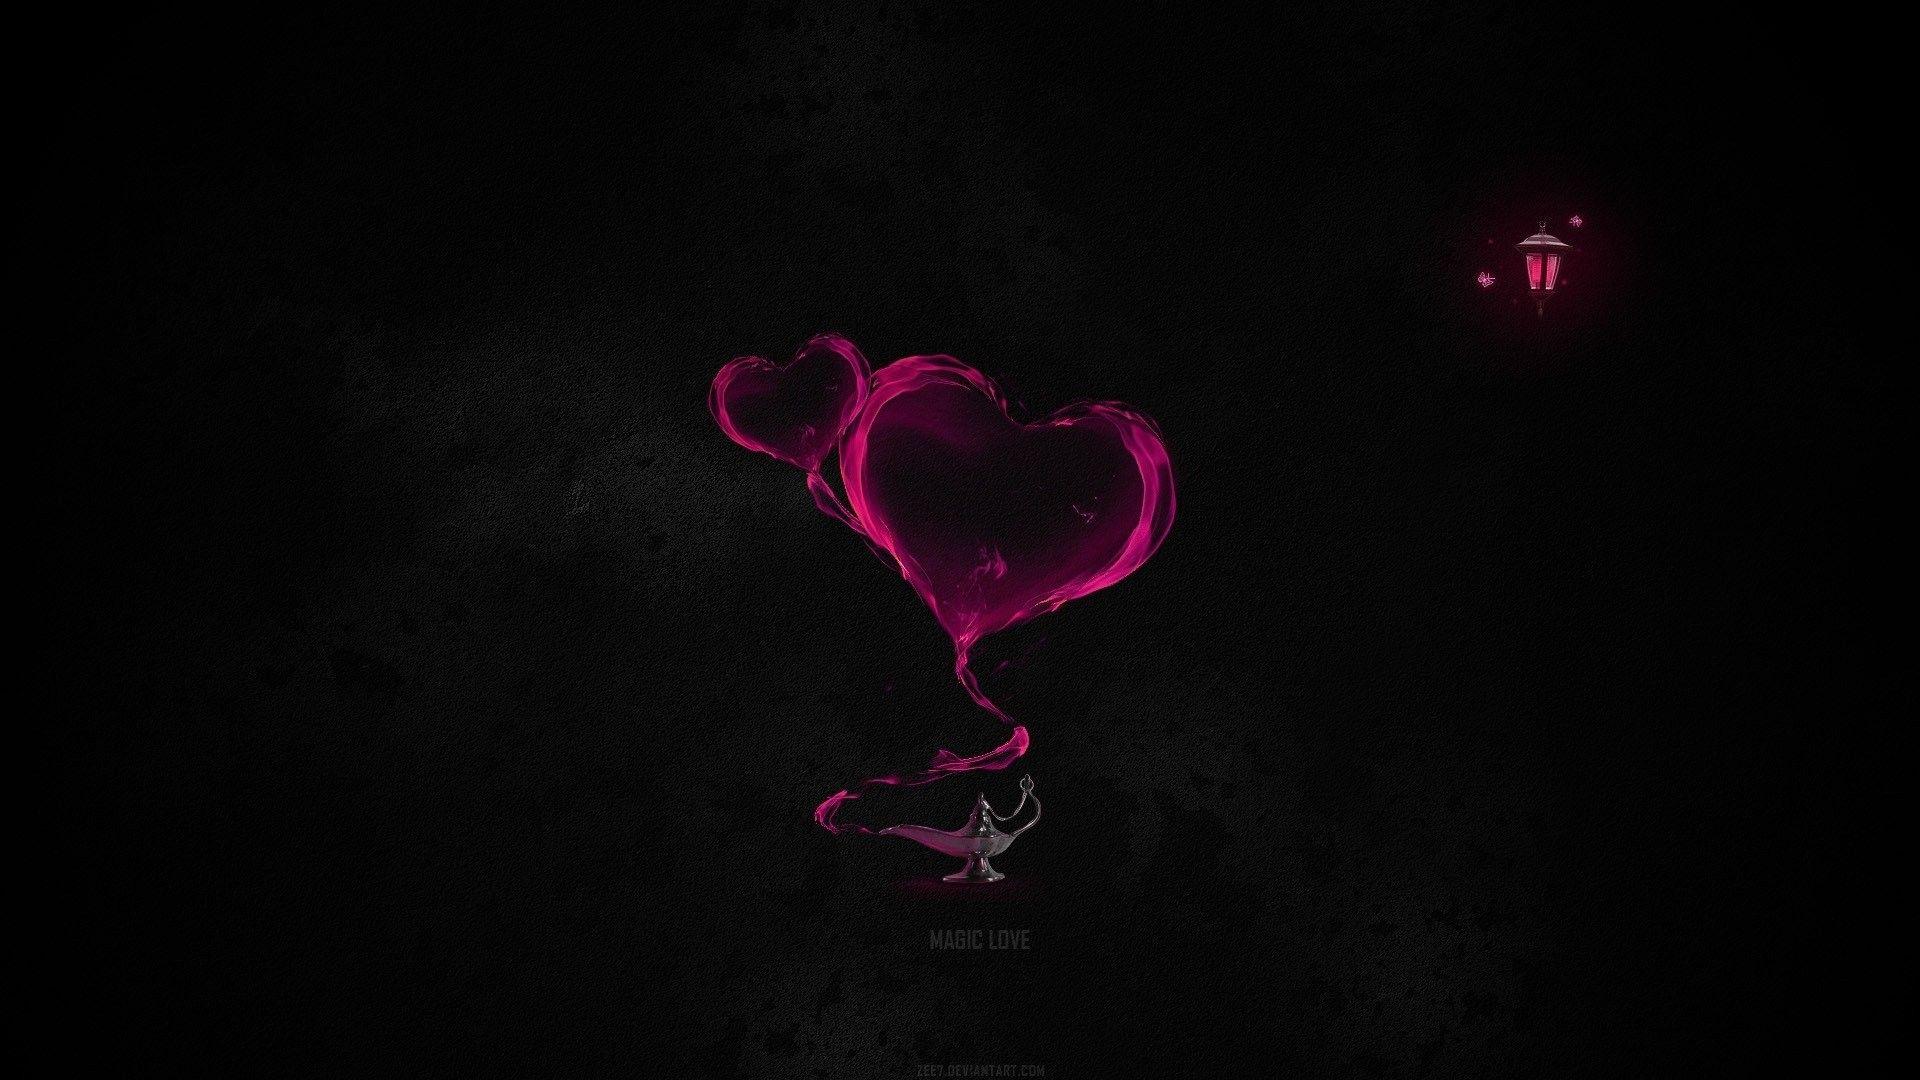 1920x1080 Pink And Black Backgrounds For Desktop Wallpaper Pink And Black Wallpaper Love Wallpaper Black Wallpaper